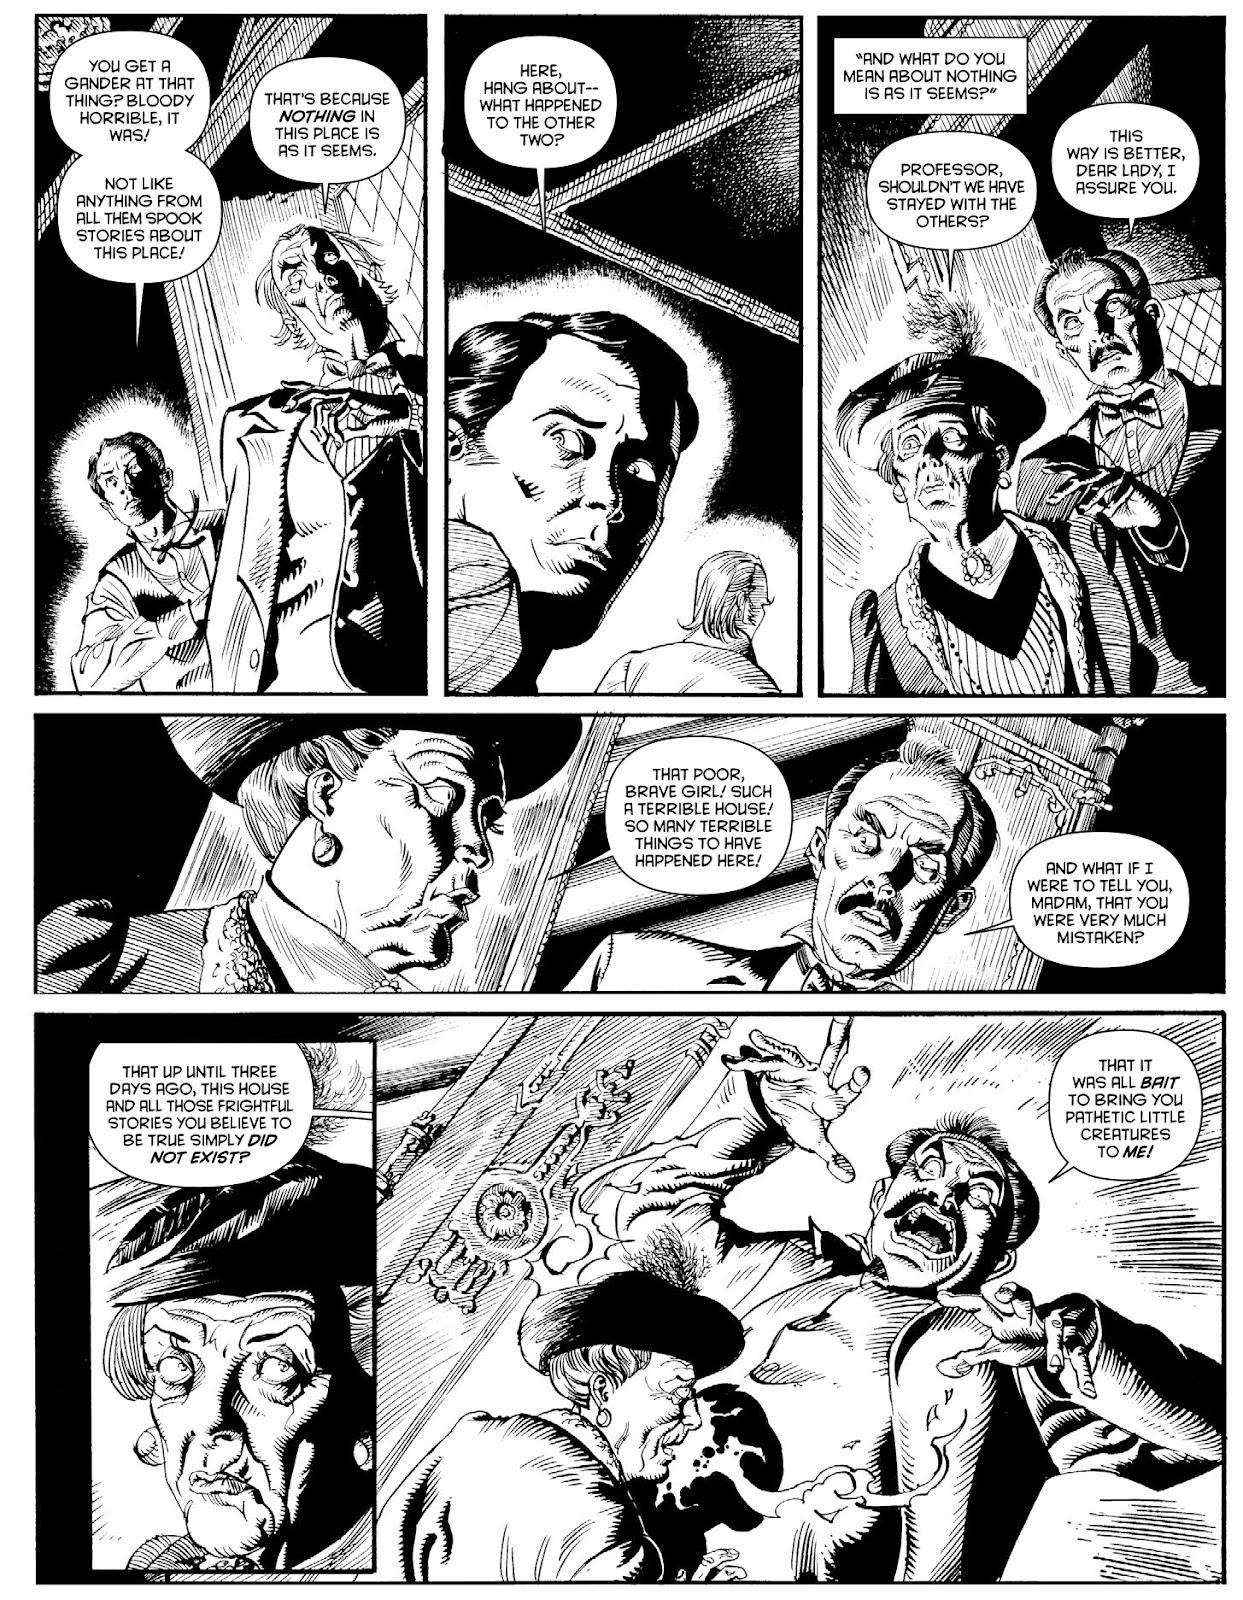 Judge Dredd Megazine (Vol. 5) issue 427 - Page 98